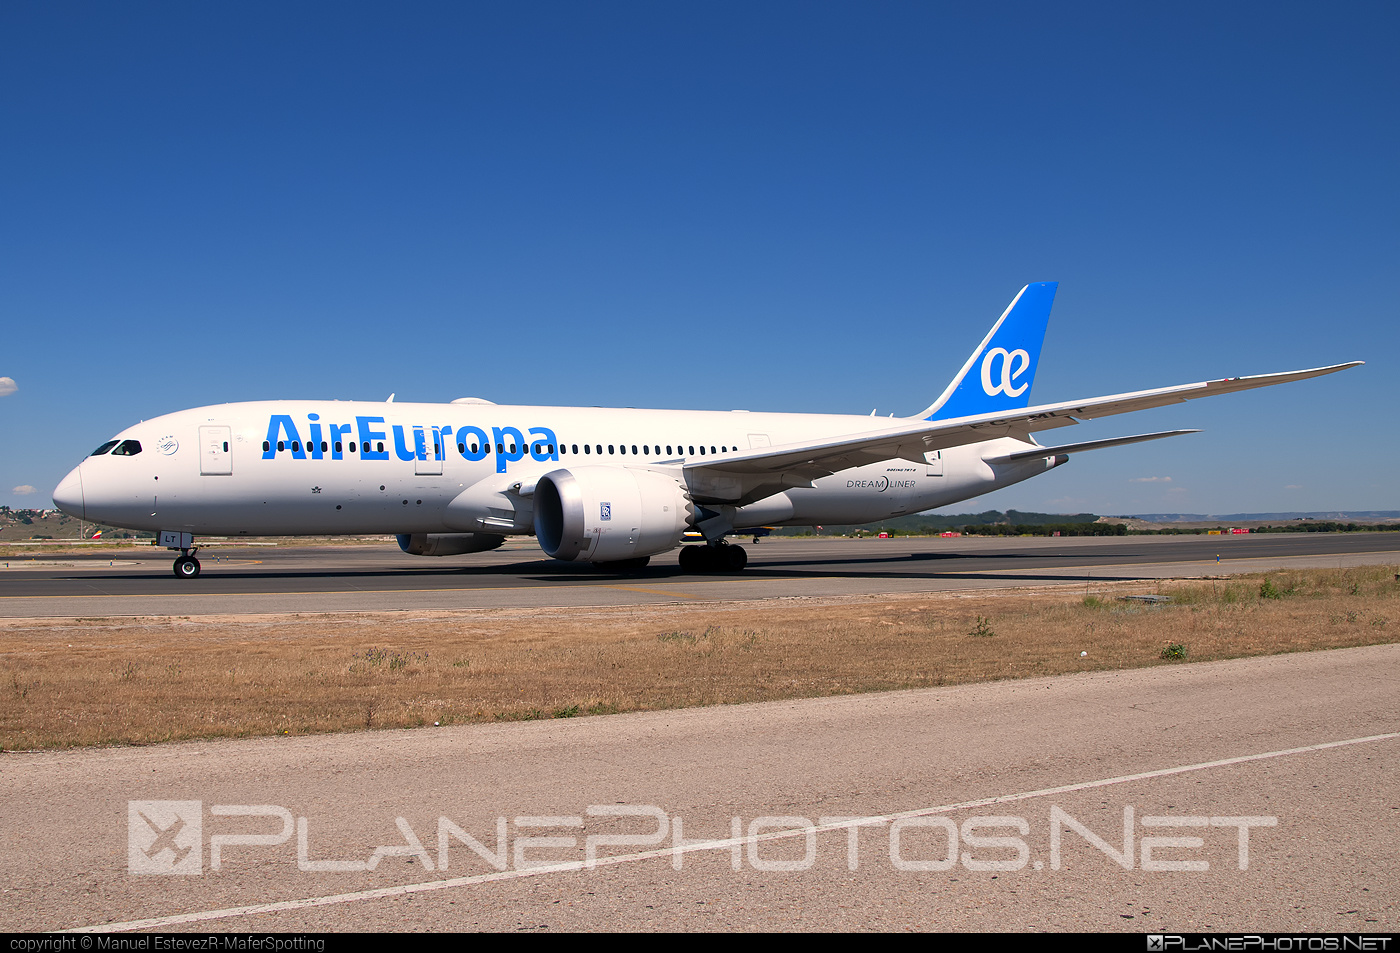 Boeing 787-8 Dreamliner - EC-MLT operated by Air Europa #b787 #boeing #boeing787 #dreamliner